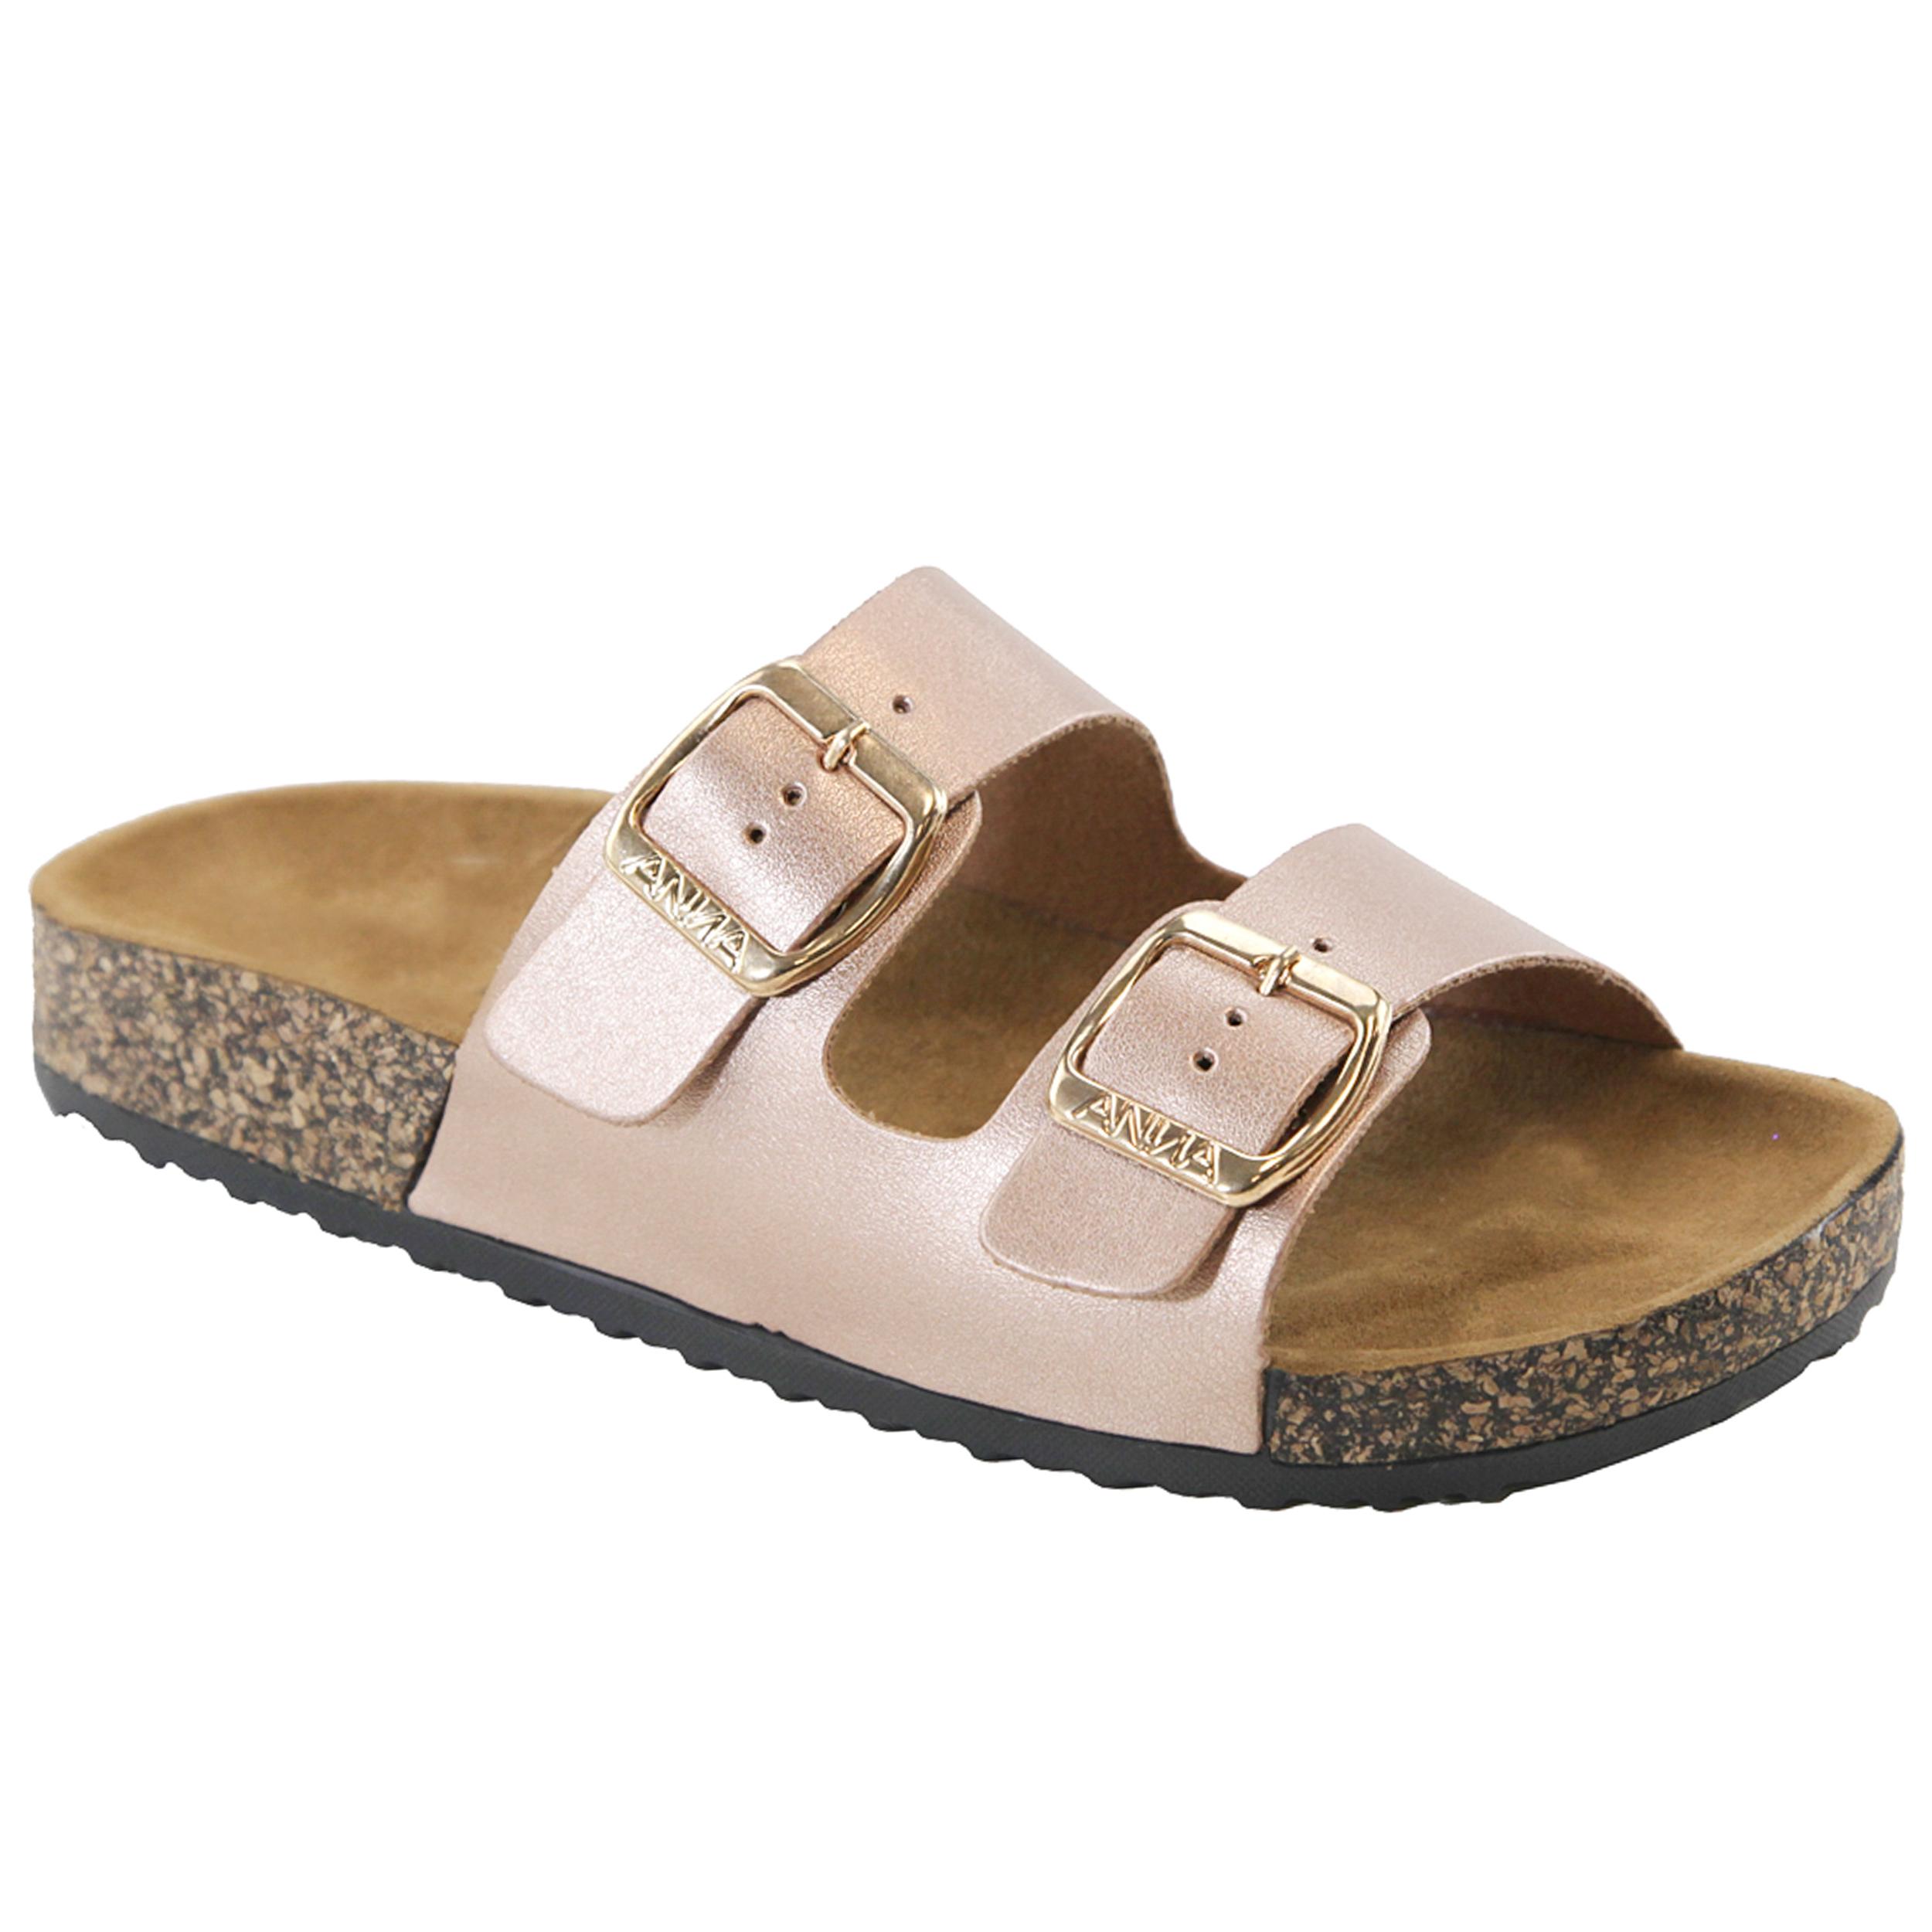 Women's Casual Buckle Straps Sandals